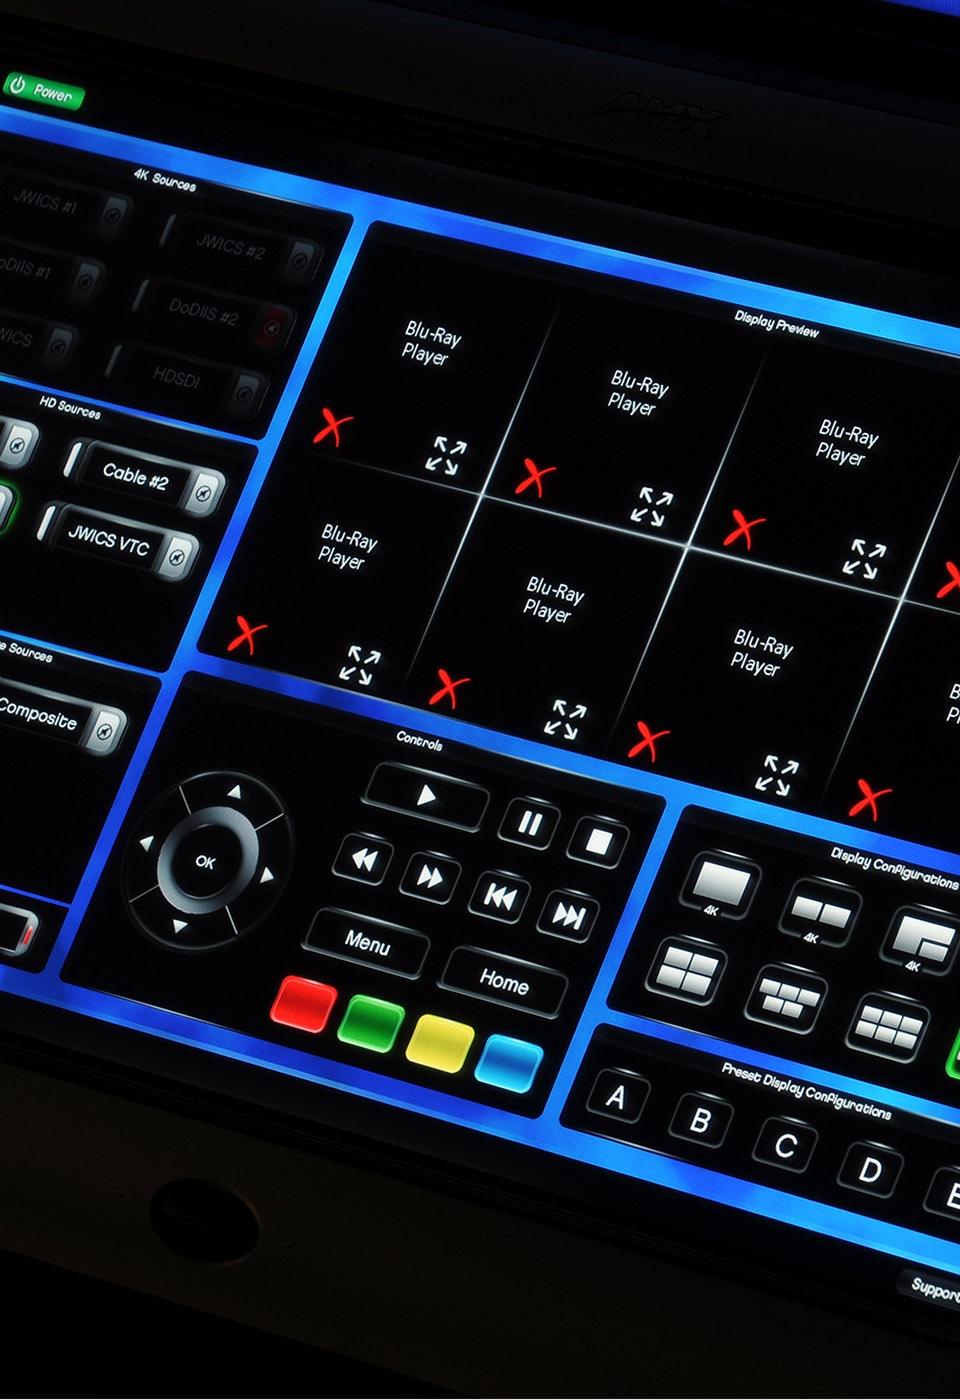 Multimedia control panel